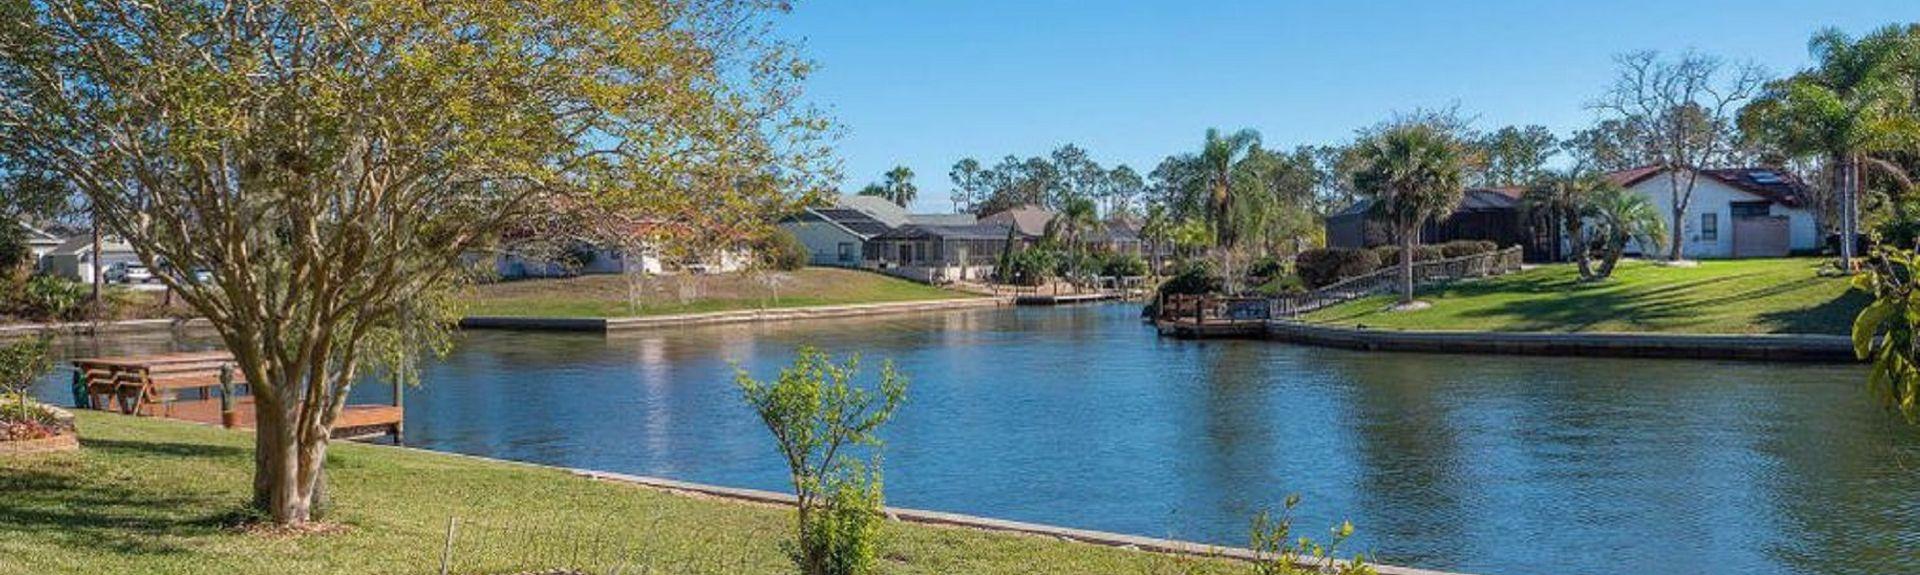 St. Augustine Shores Golf Club, St. Augustine, FL, USA